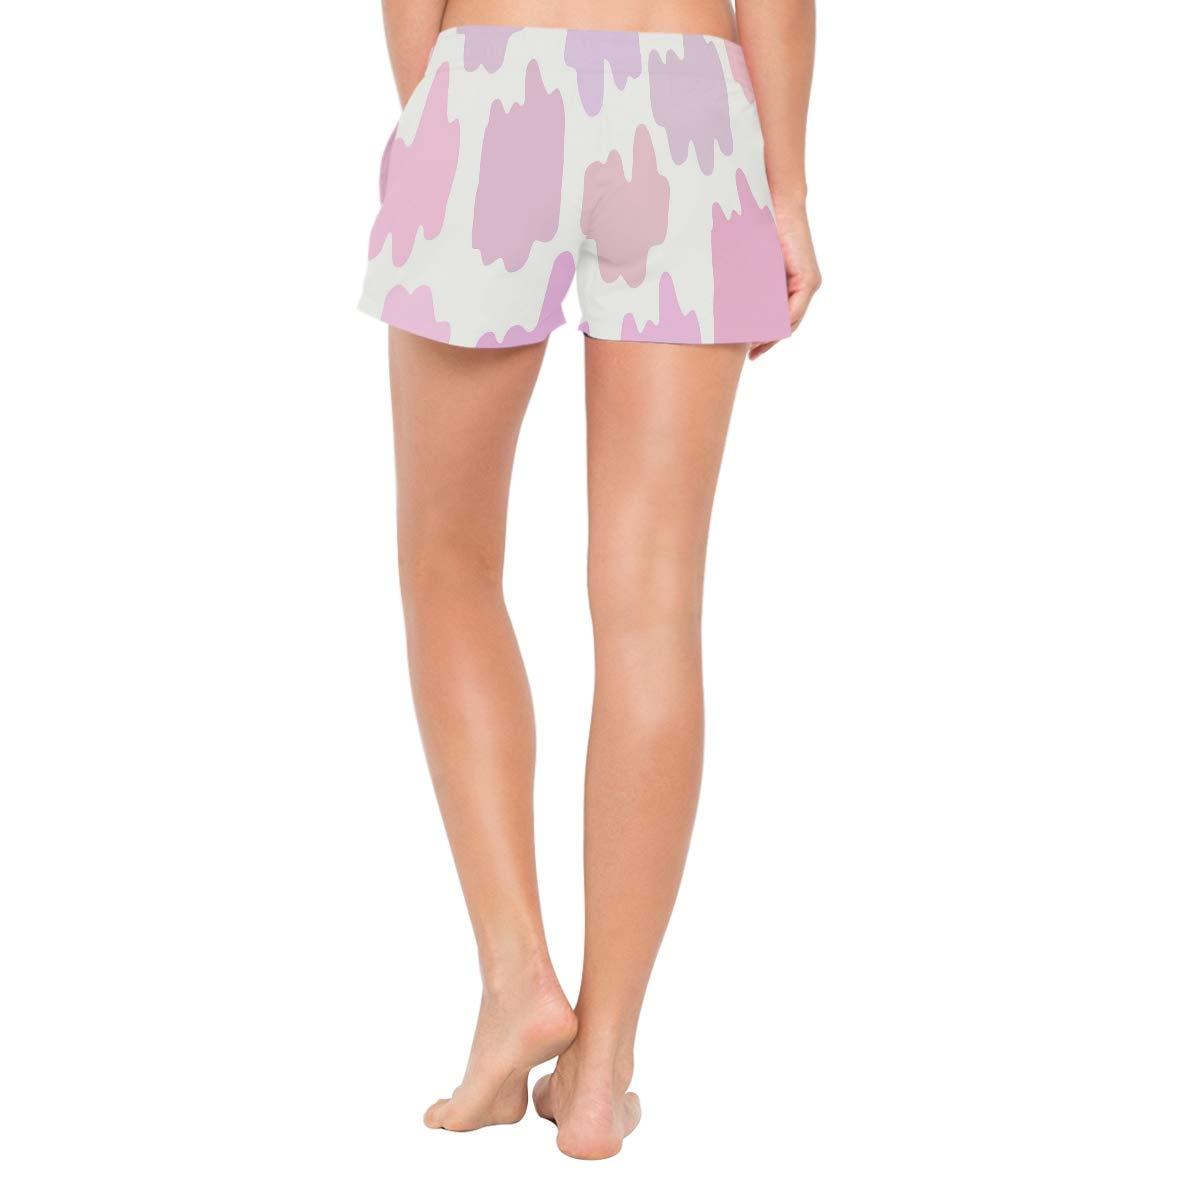 MALPLENA Womens Board Shorts Pink Spots Quick Dry Beach Boardshorts